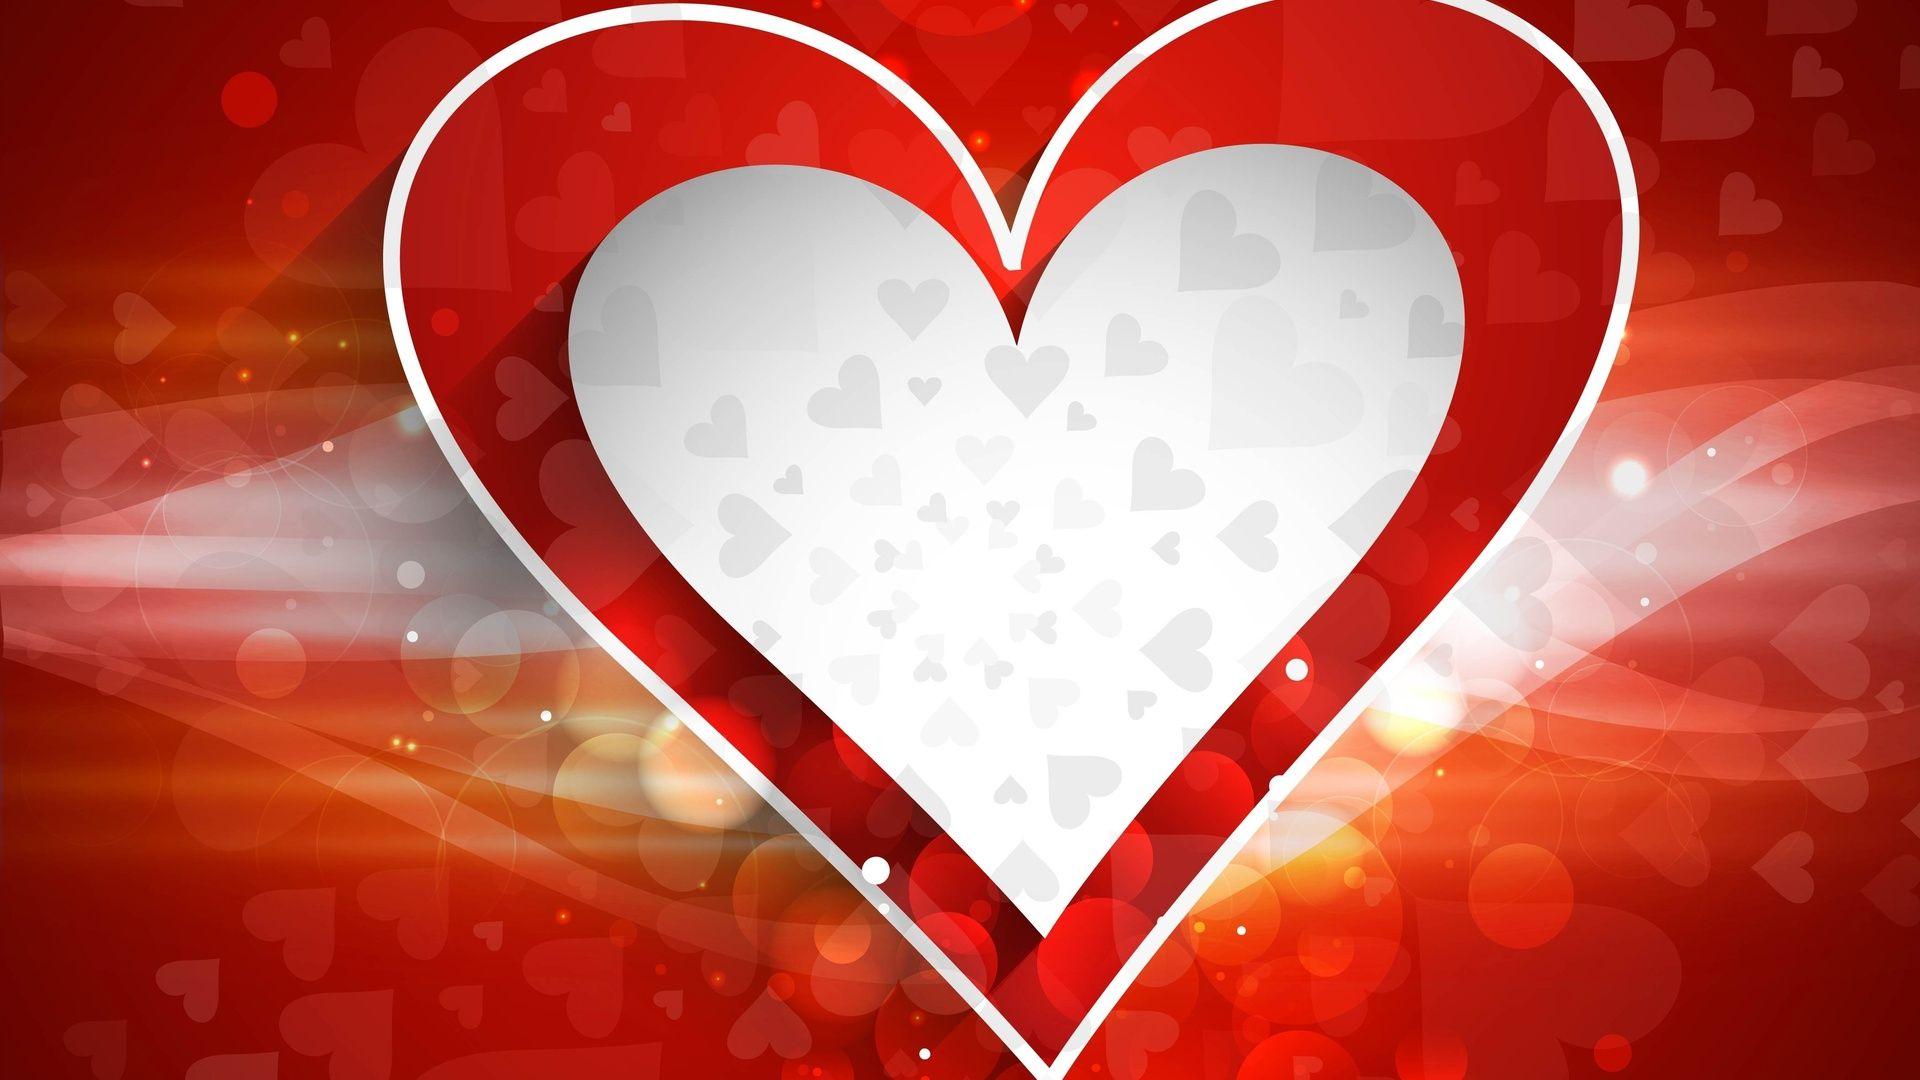 Heart laptop background wallpaper